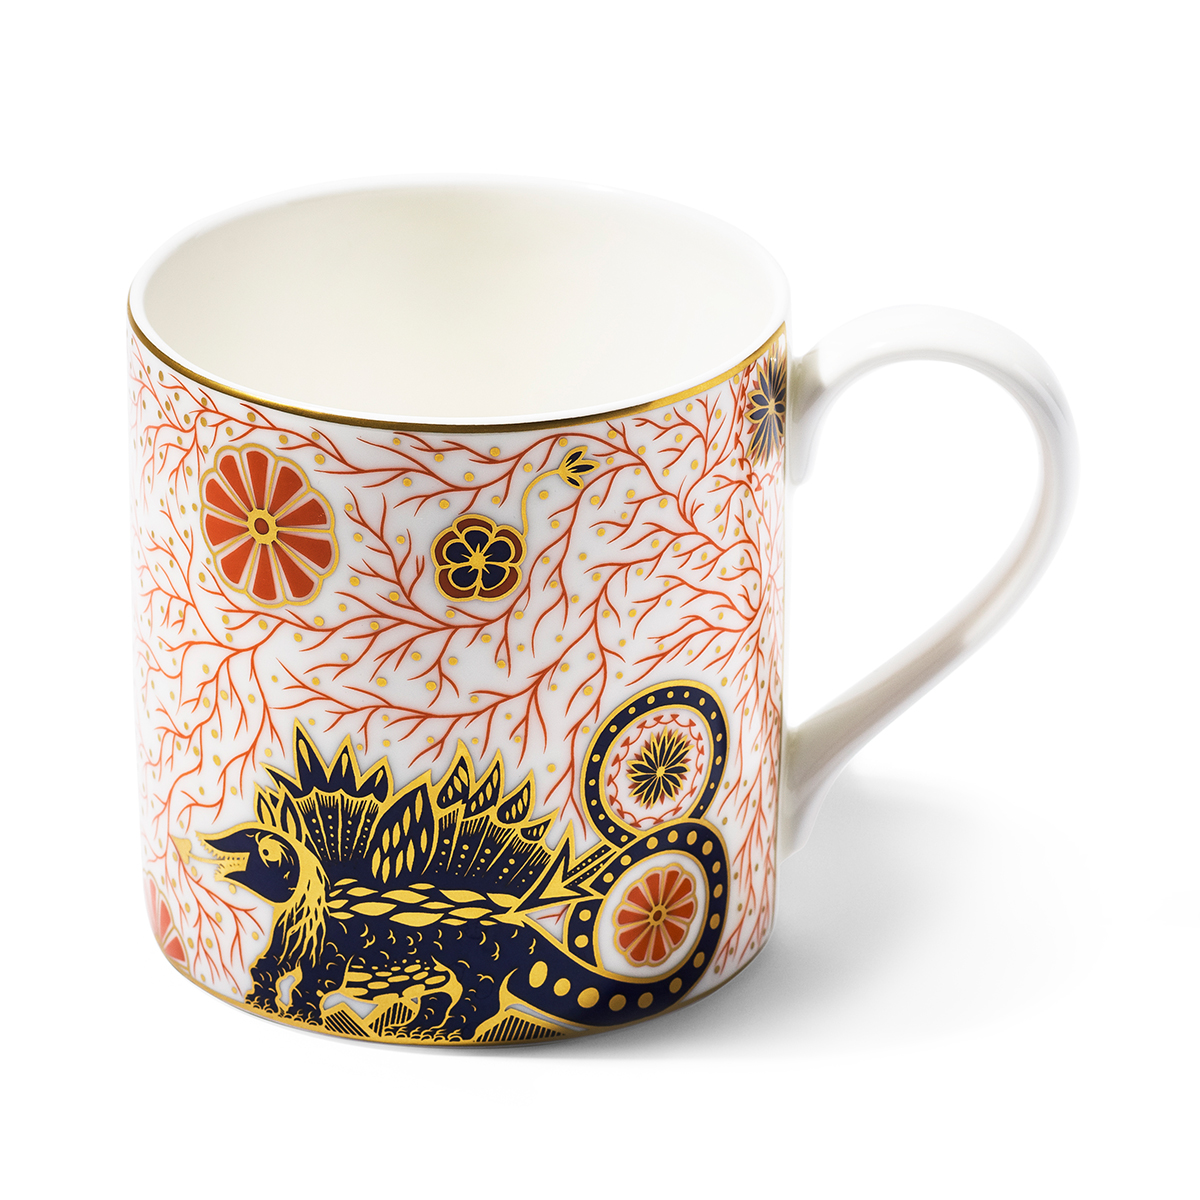 Mythical Beasts mug by Richard Brendon